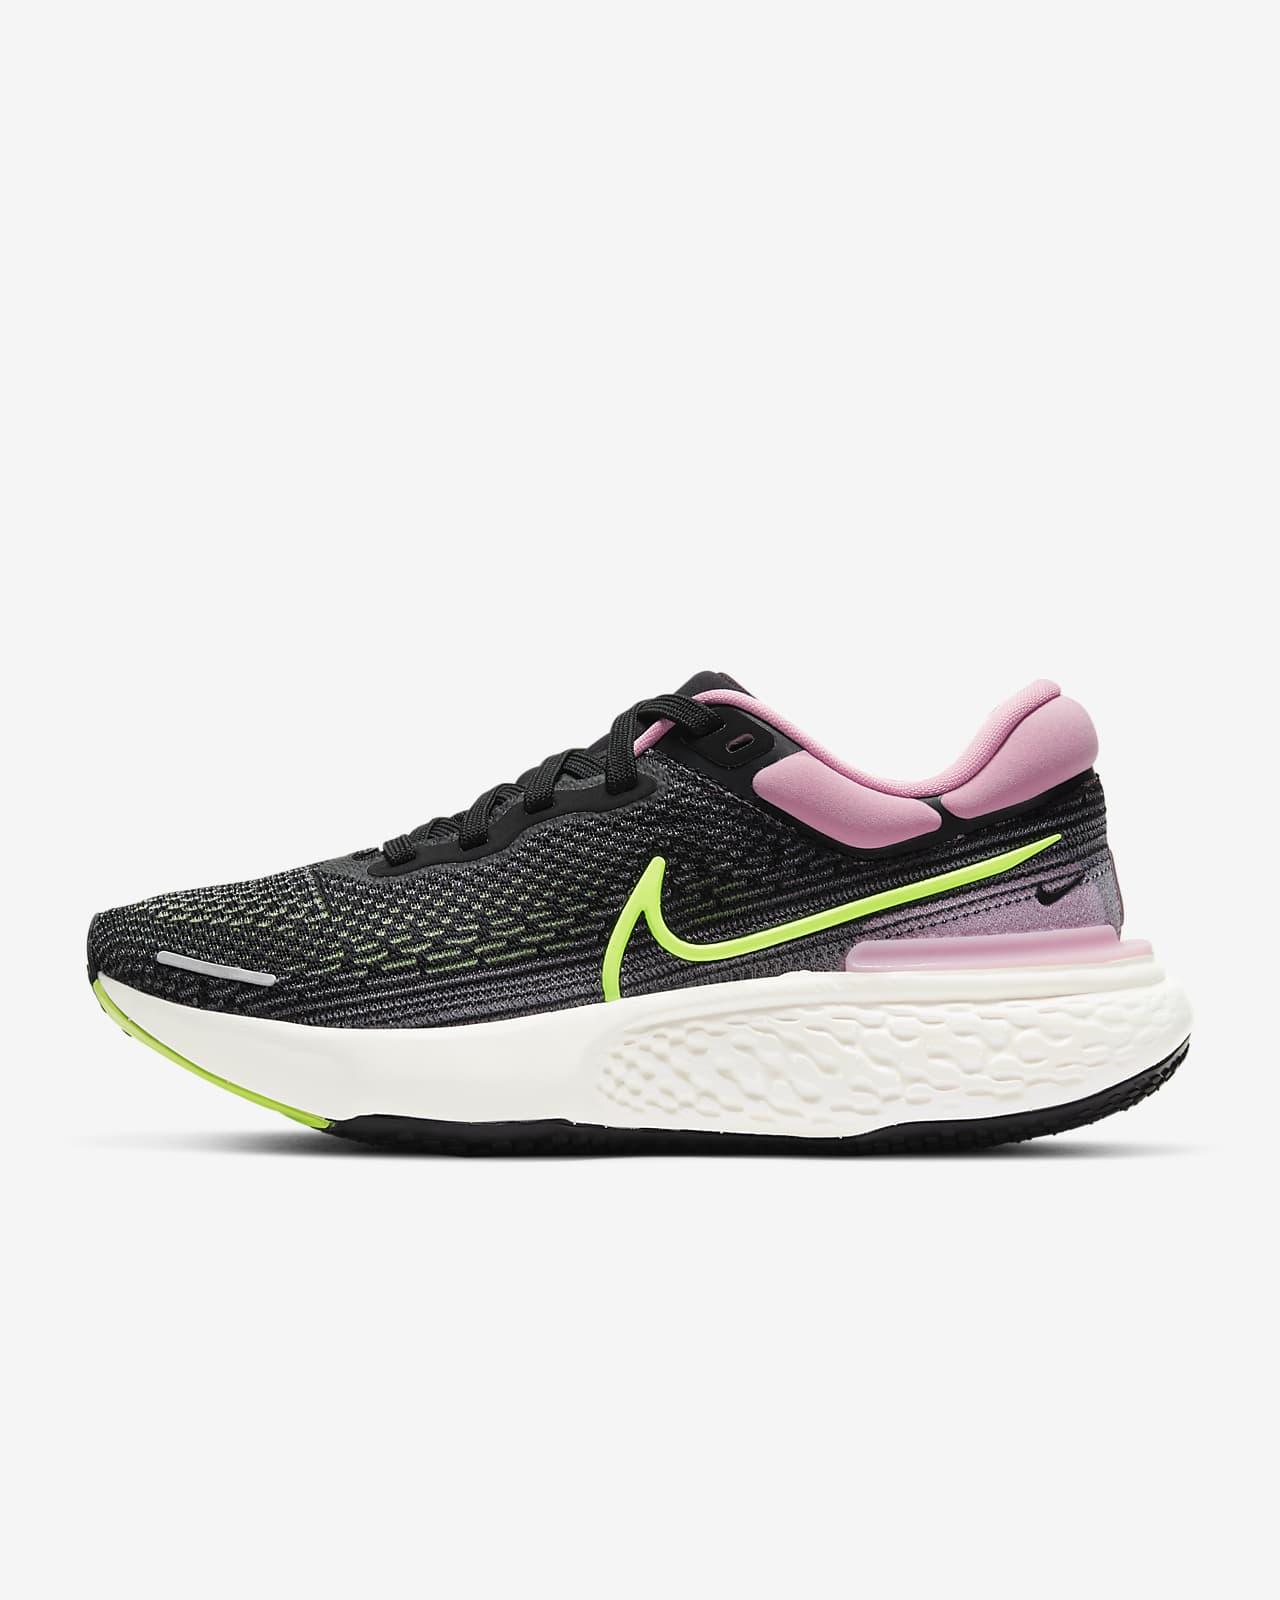 Chaussure de running Nike ZoomX Invincible Run Flyknit pour Femme